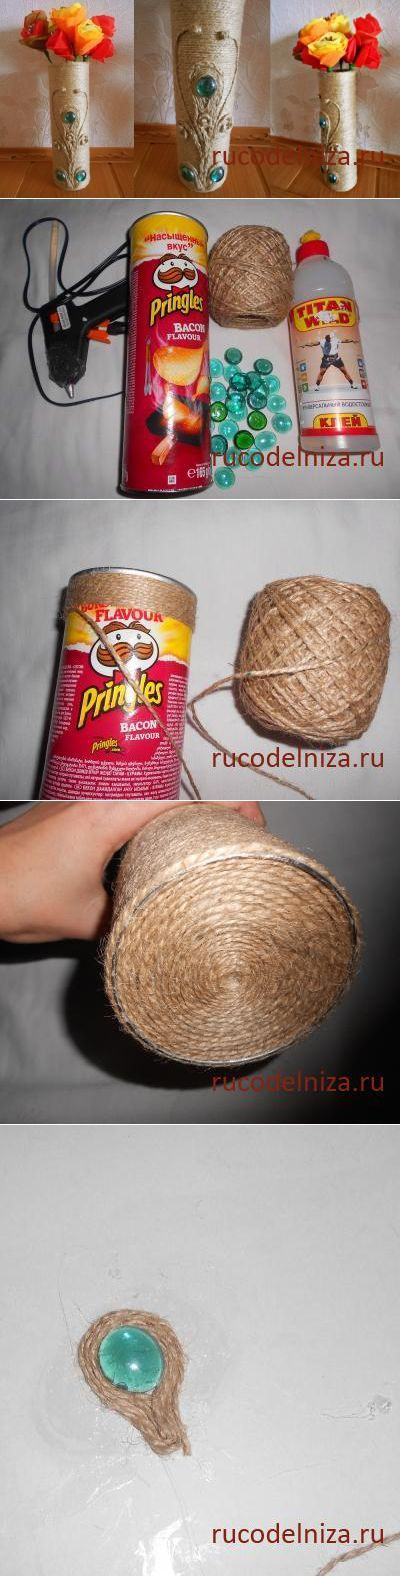 Сайт Рукодельница. Мастер-классы: рукоделие, кулинария OlgaK13 » дневник » Ваза из шпагата и упаковки Pringles